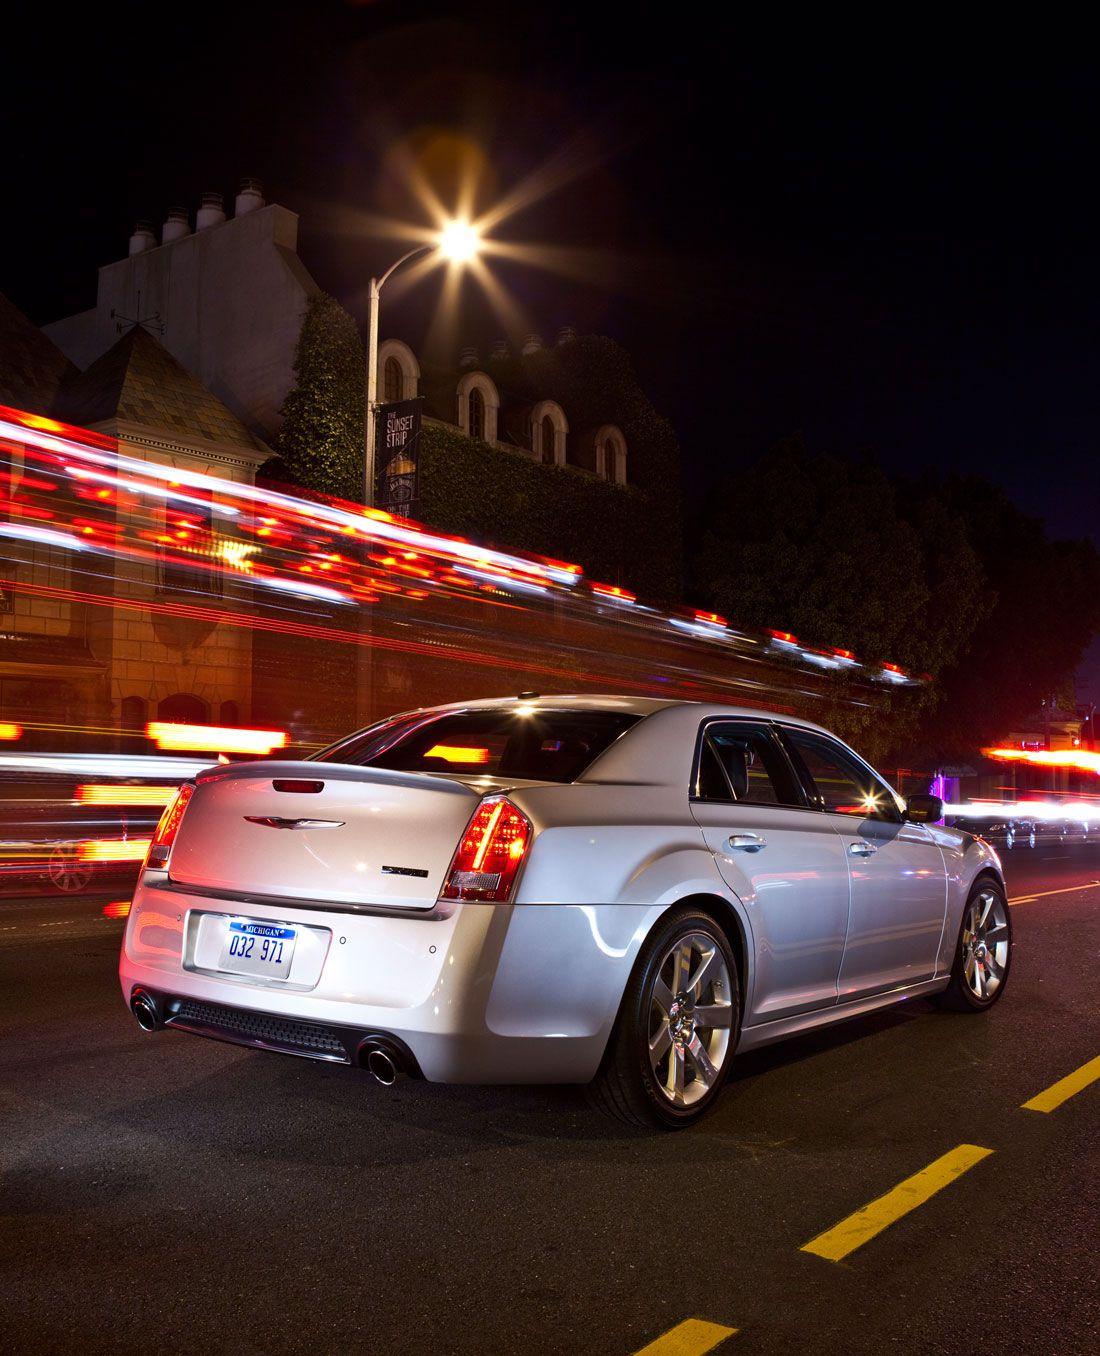 2012 Chrysler 300 Luxury Series 4k Hd Wallpaper: Pin By Salvador Salinas On Car And Trucks